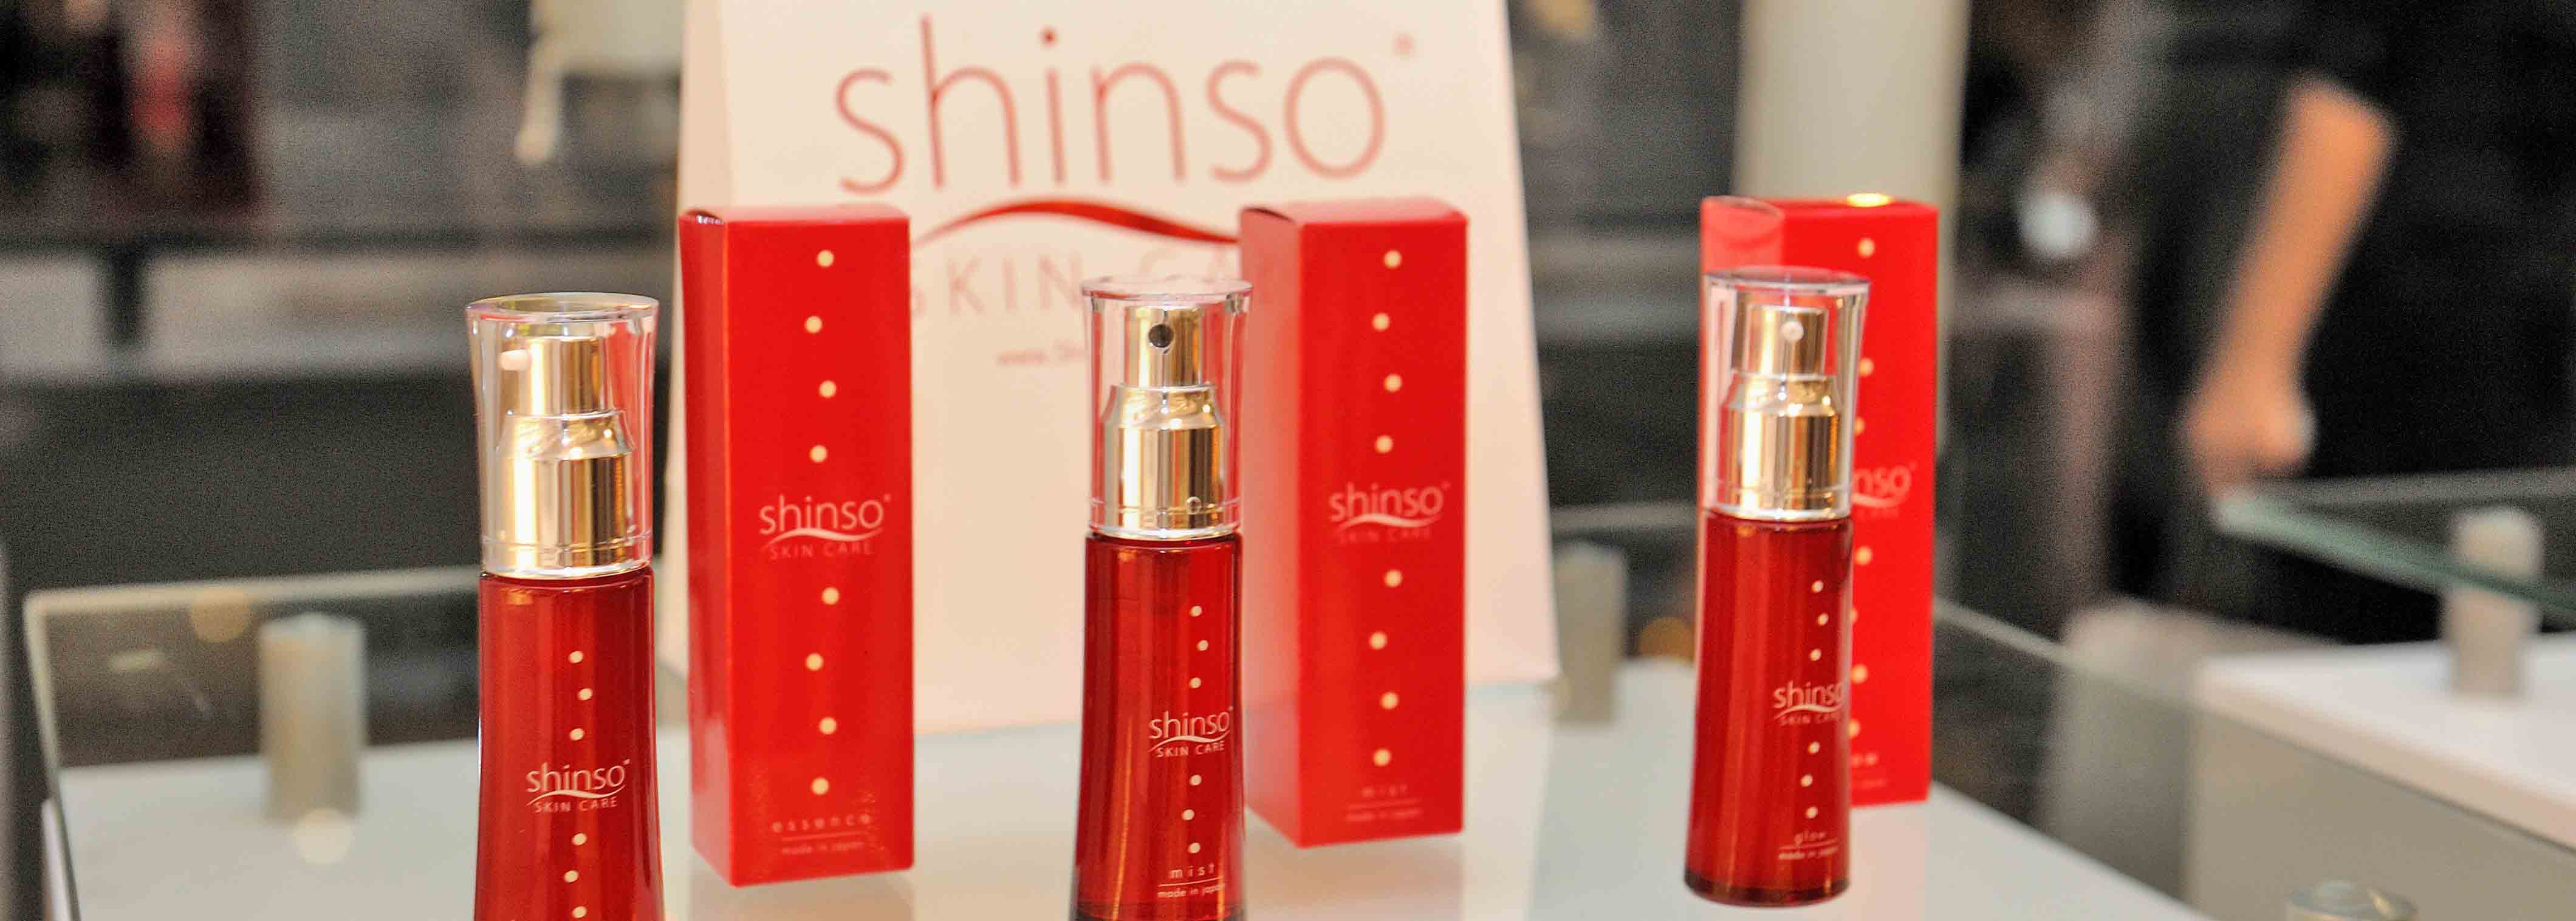 Shinso